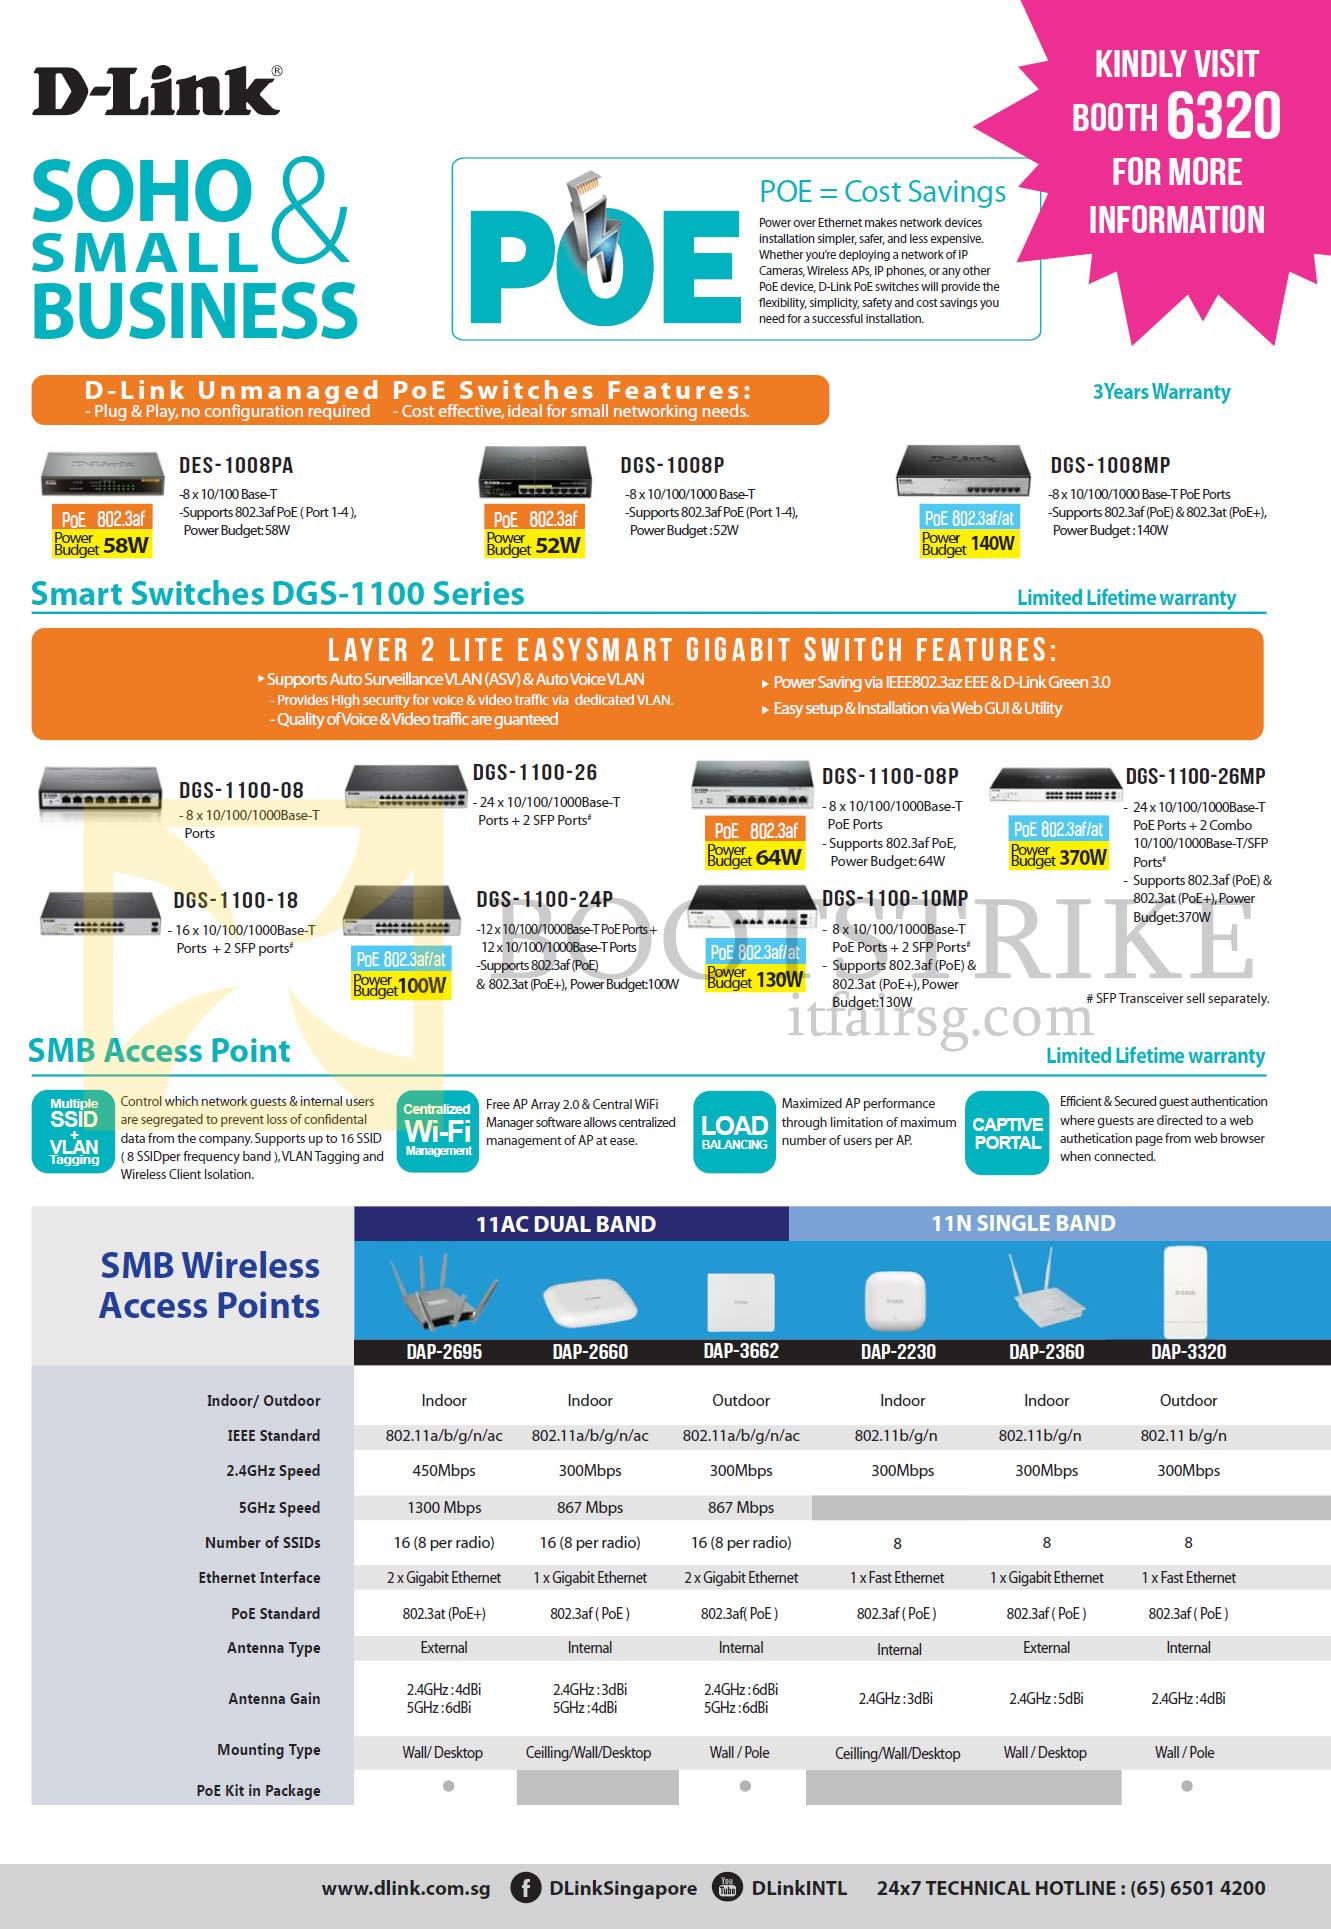 COMEX 2016 price list image brochure of D-Link Networking Business Switches, Access Points, DES-1008PA, DGS-1008P, 1008MP, 1100-08, 26, 08P, 26MP, 18, 24P, 10MP, DAP-2695, 2660, 3662, 2230, 2360, 3320